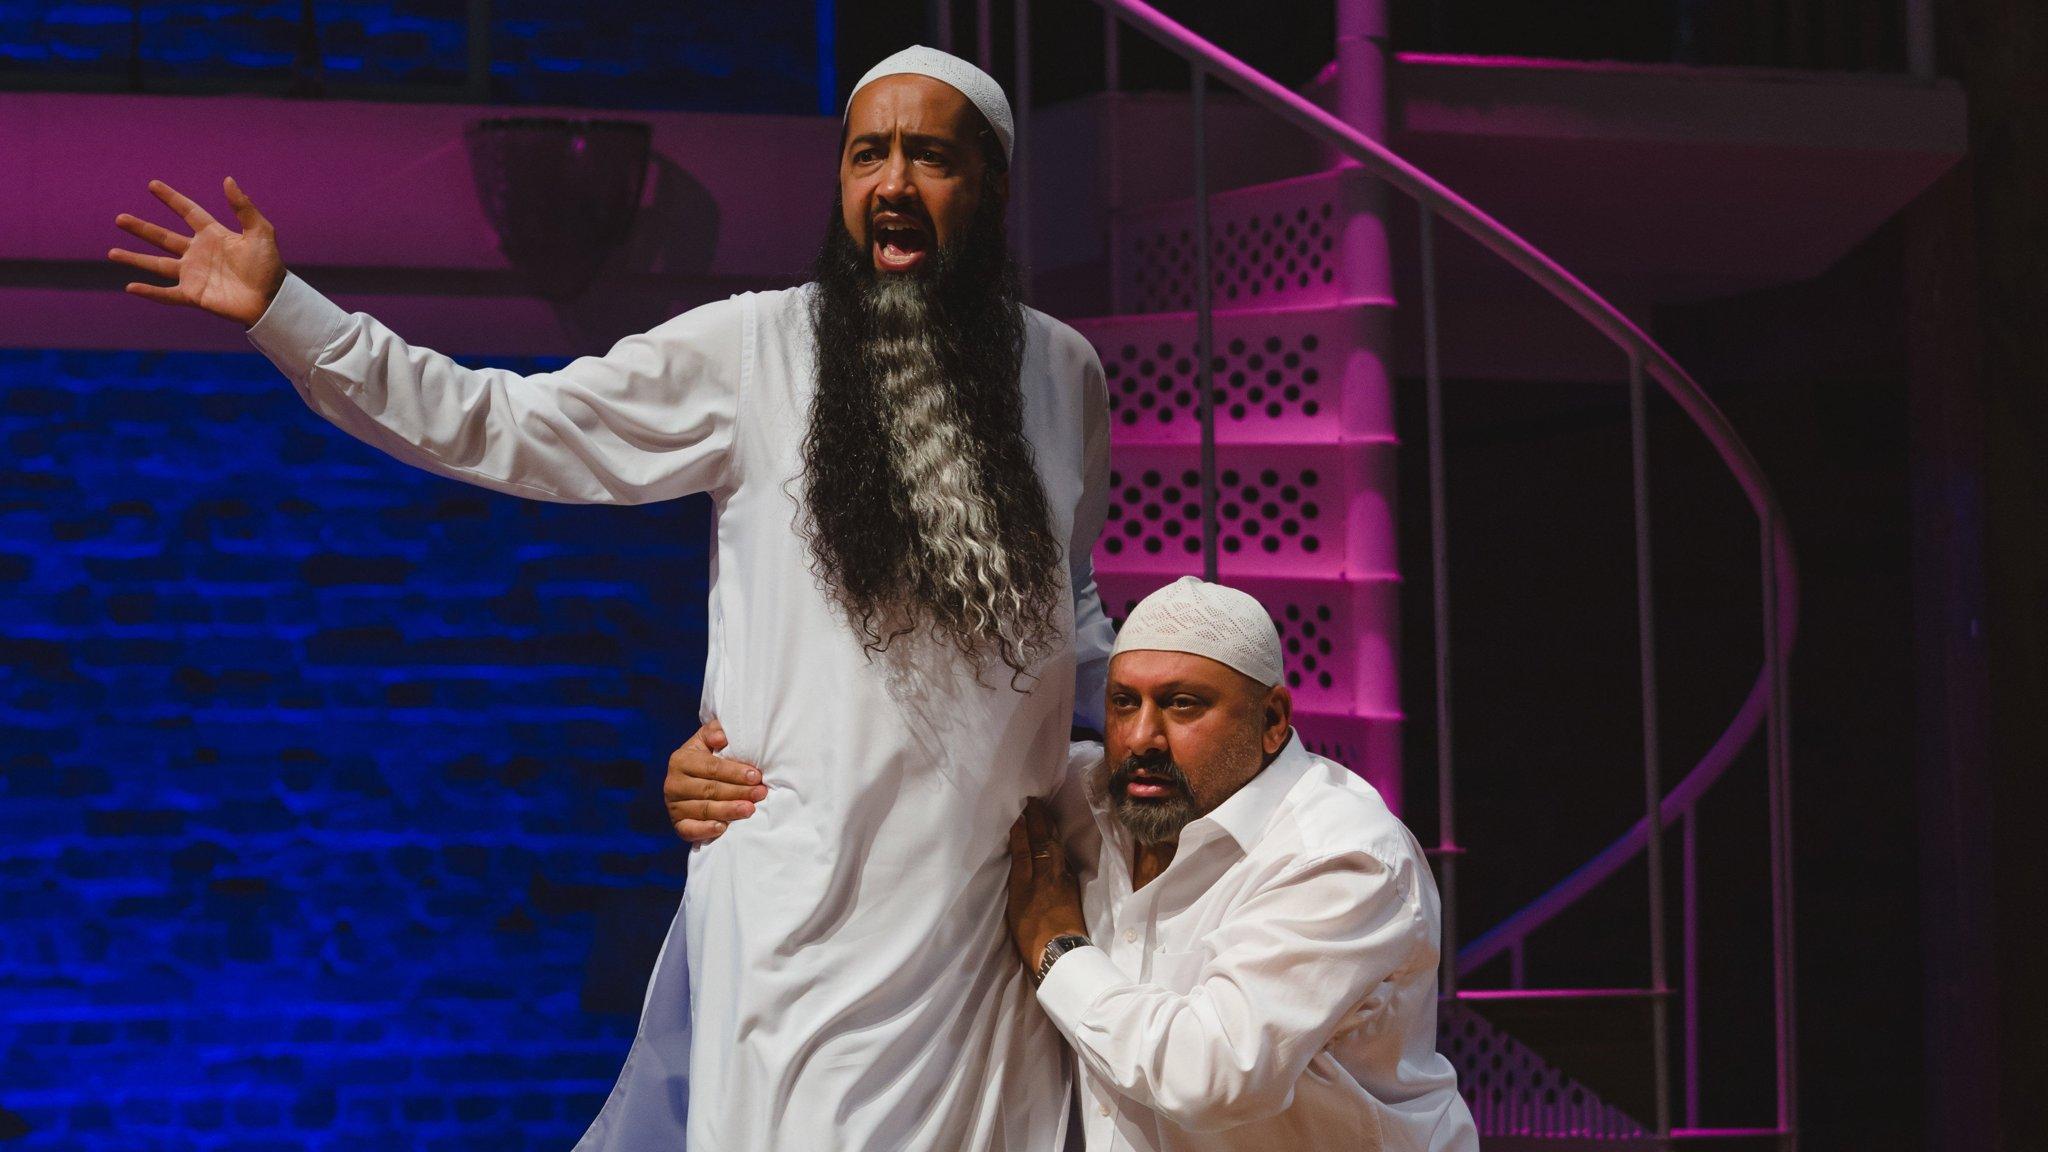 Tartuffe, Swan Theatre, Stratford-upon-Avon — biting satire